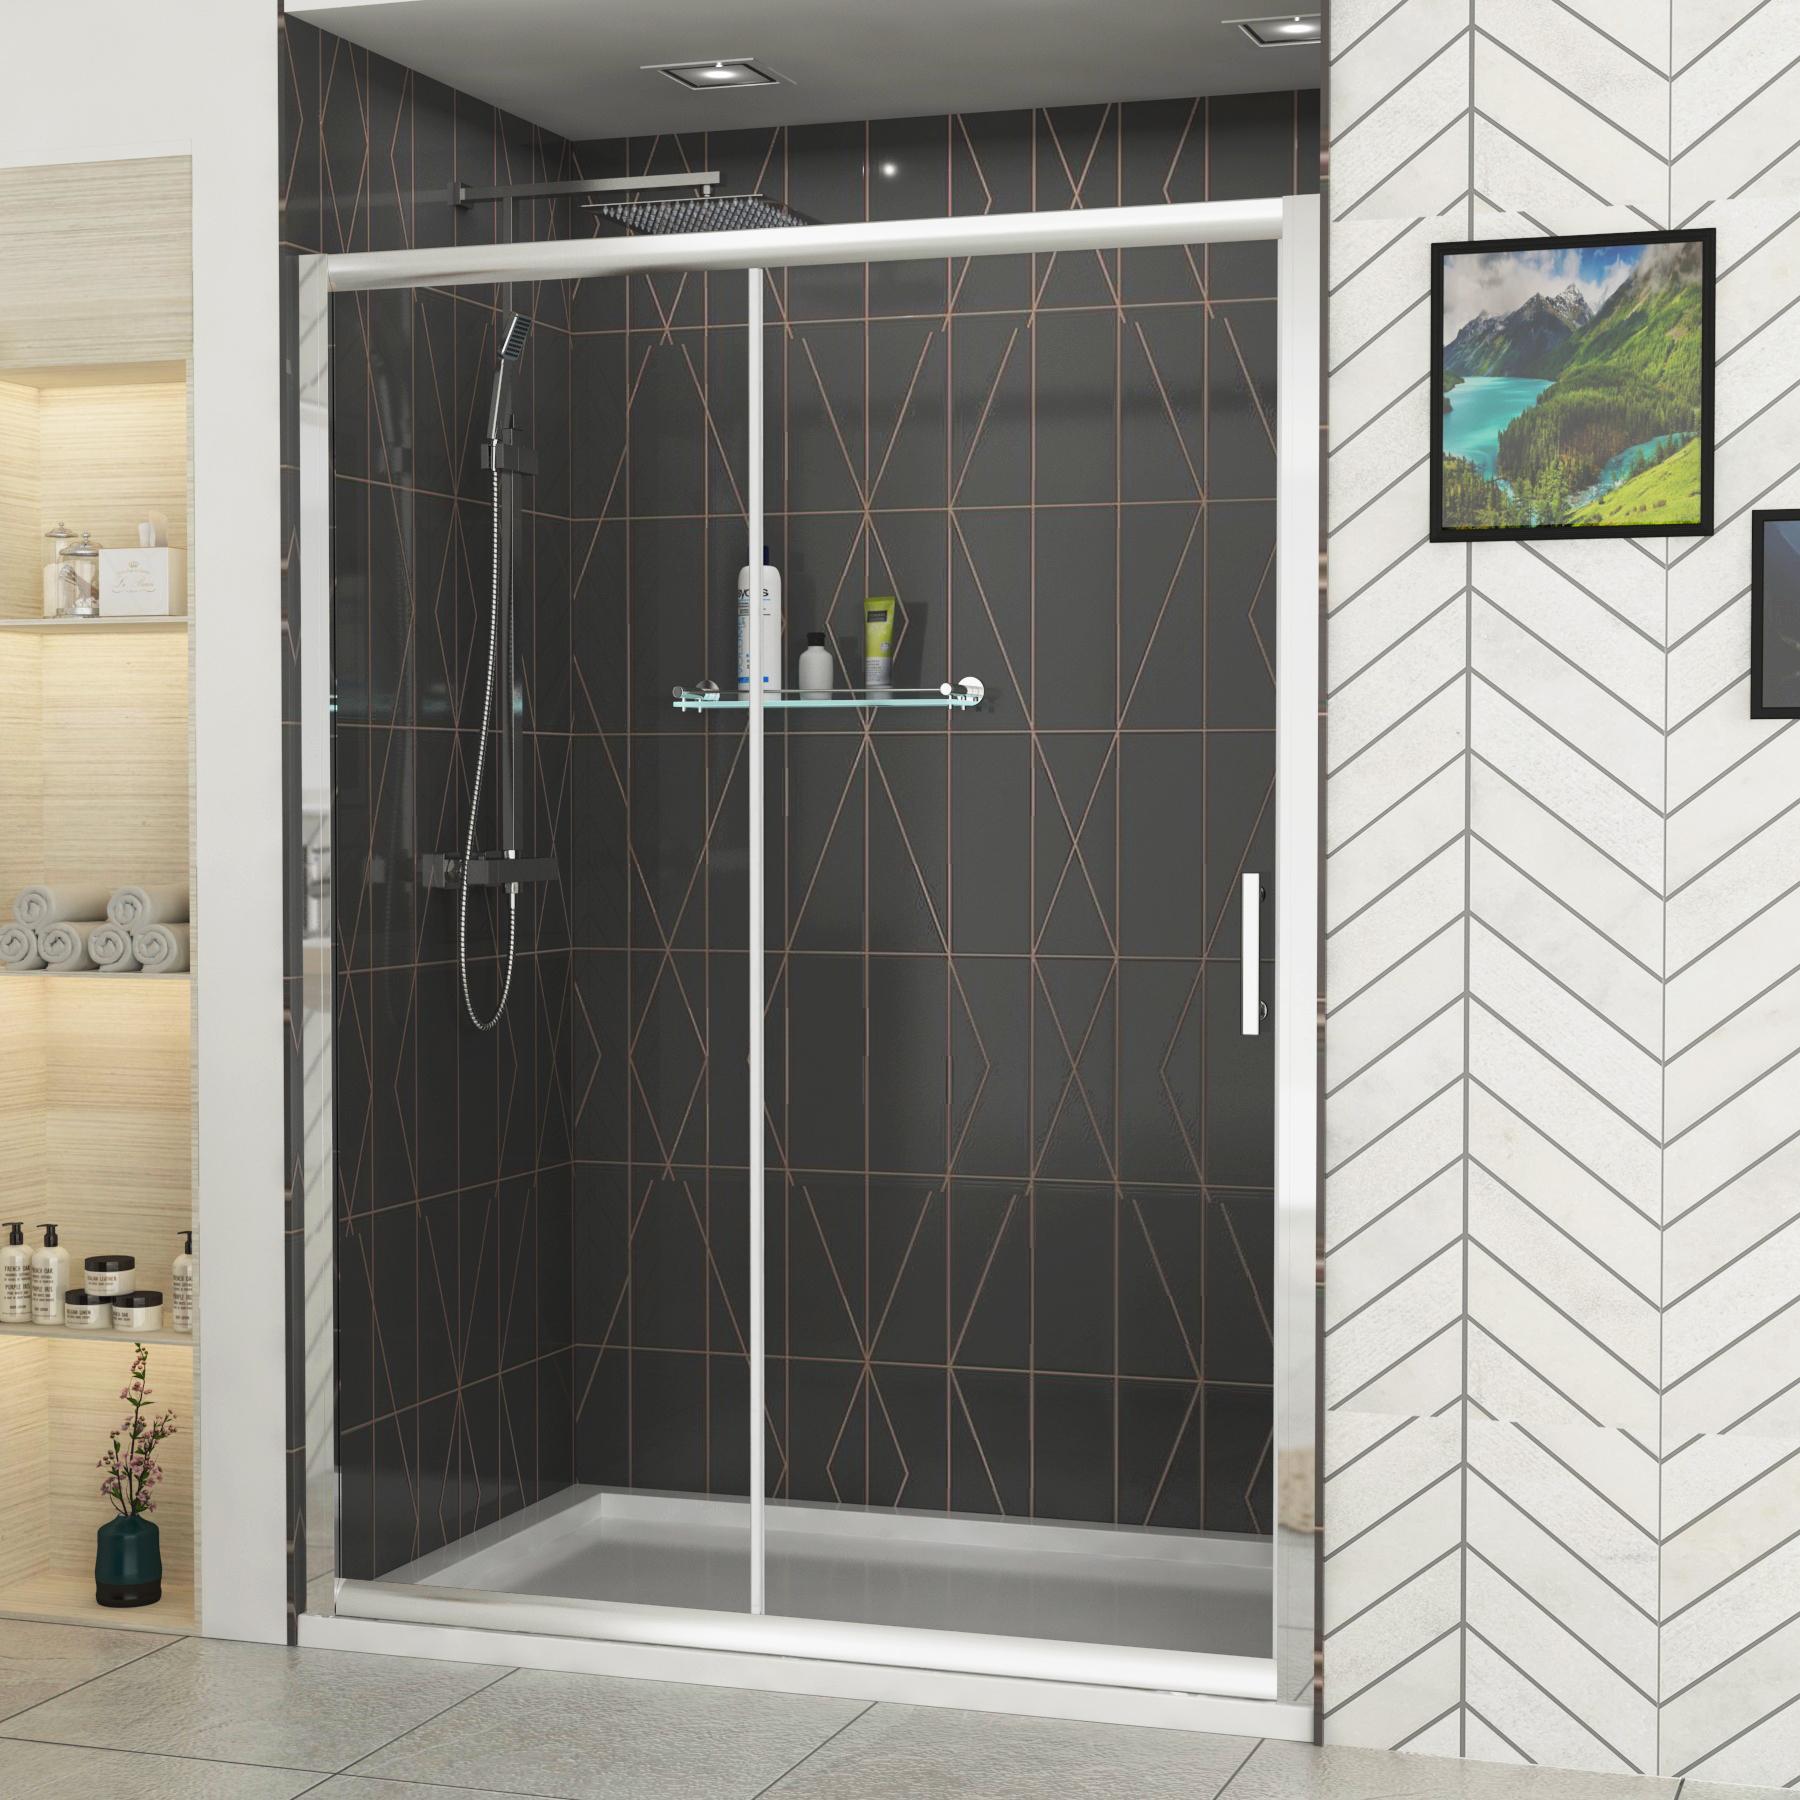 Royal Bathrooms Grand 6mm Sliding Shower Door 1700mm